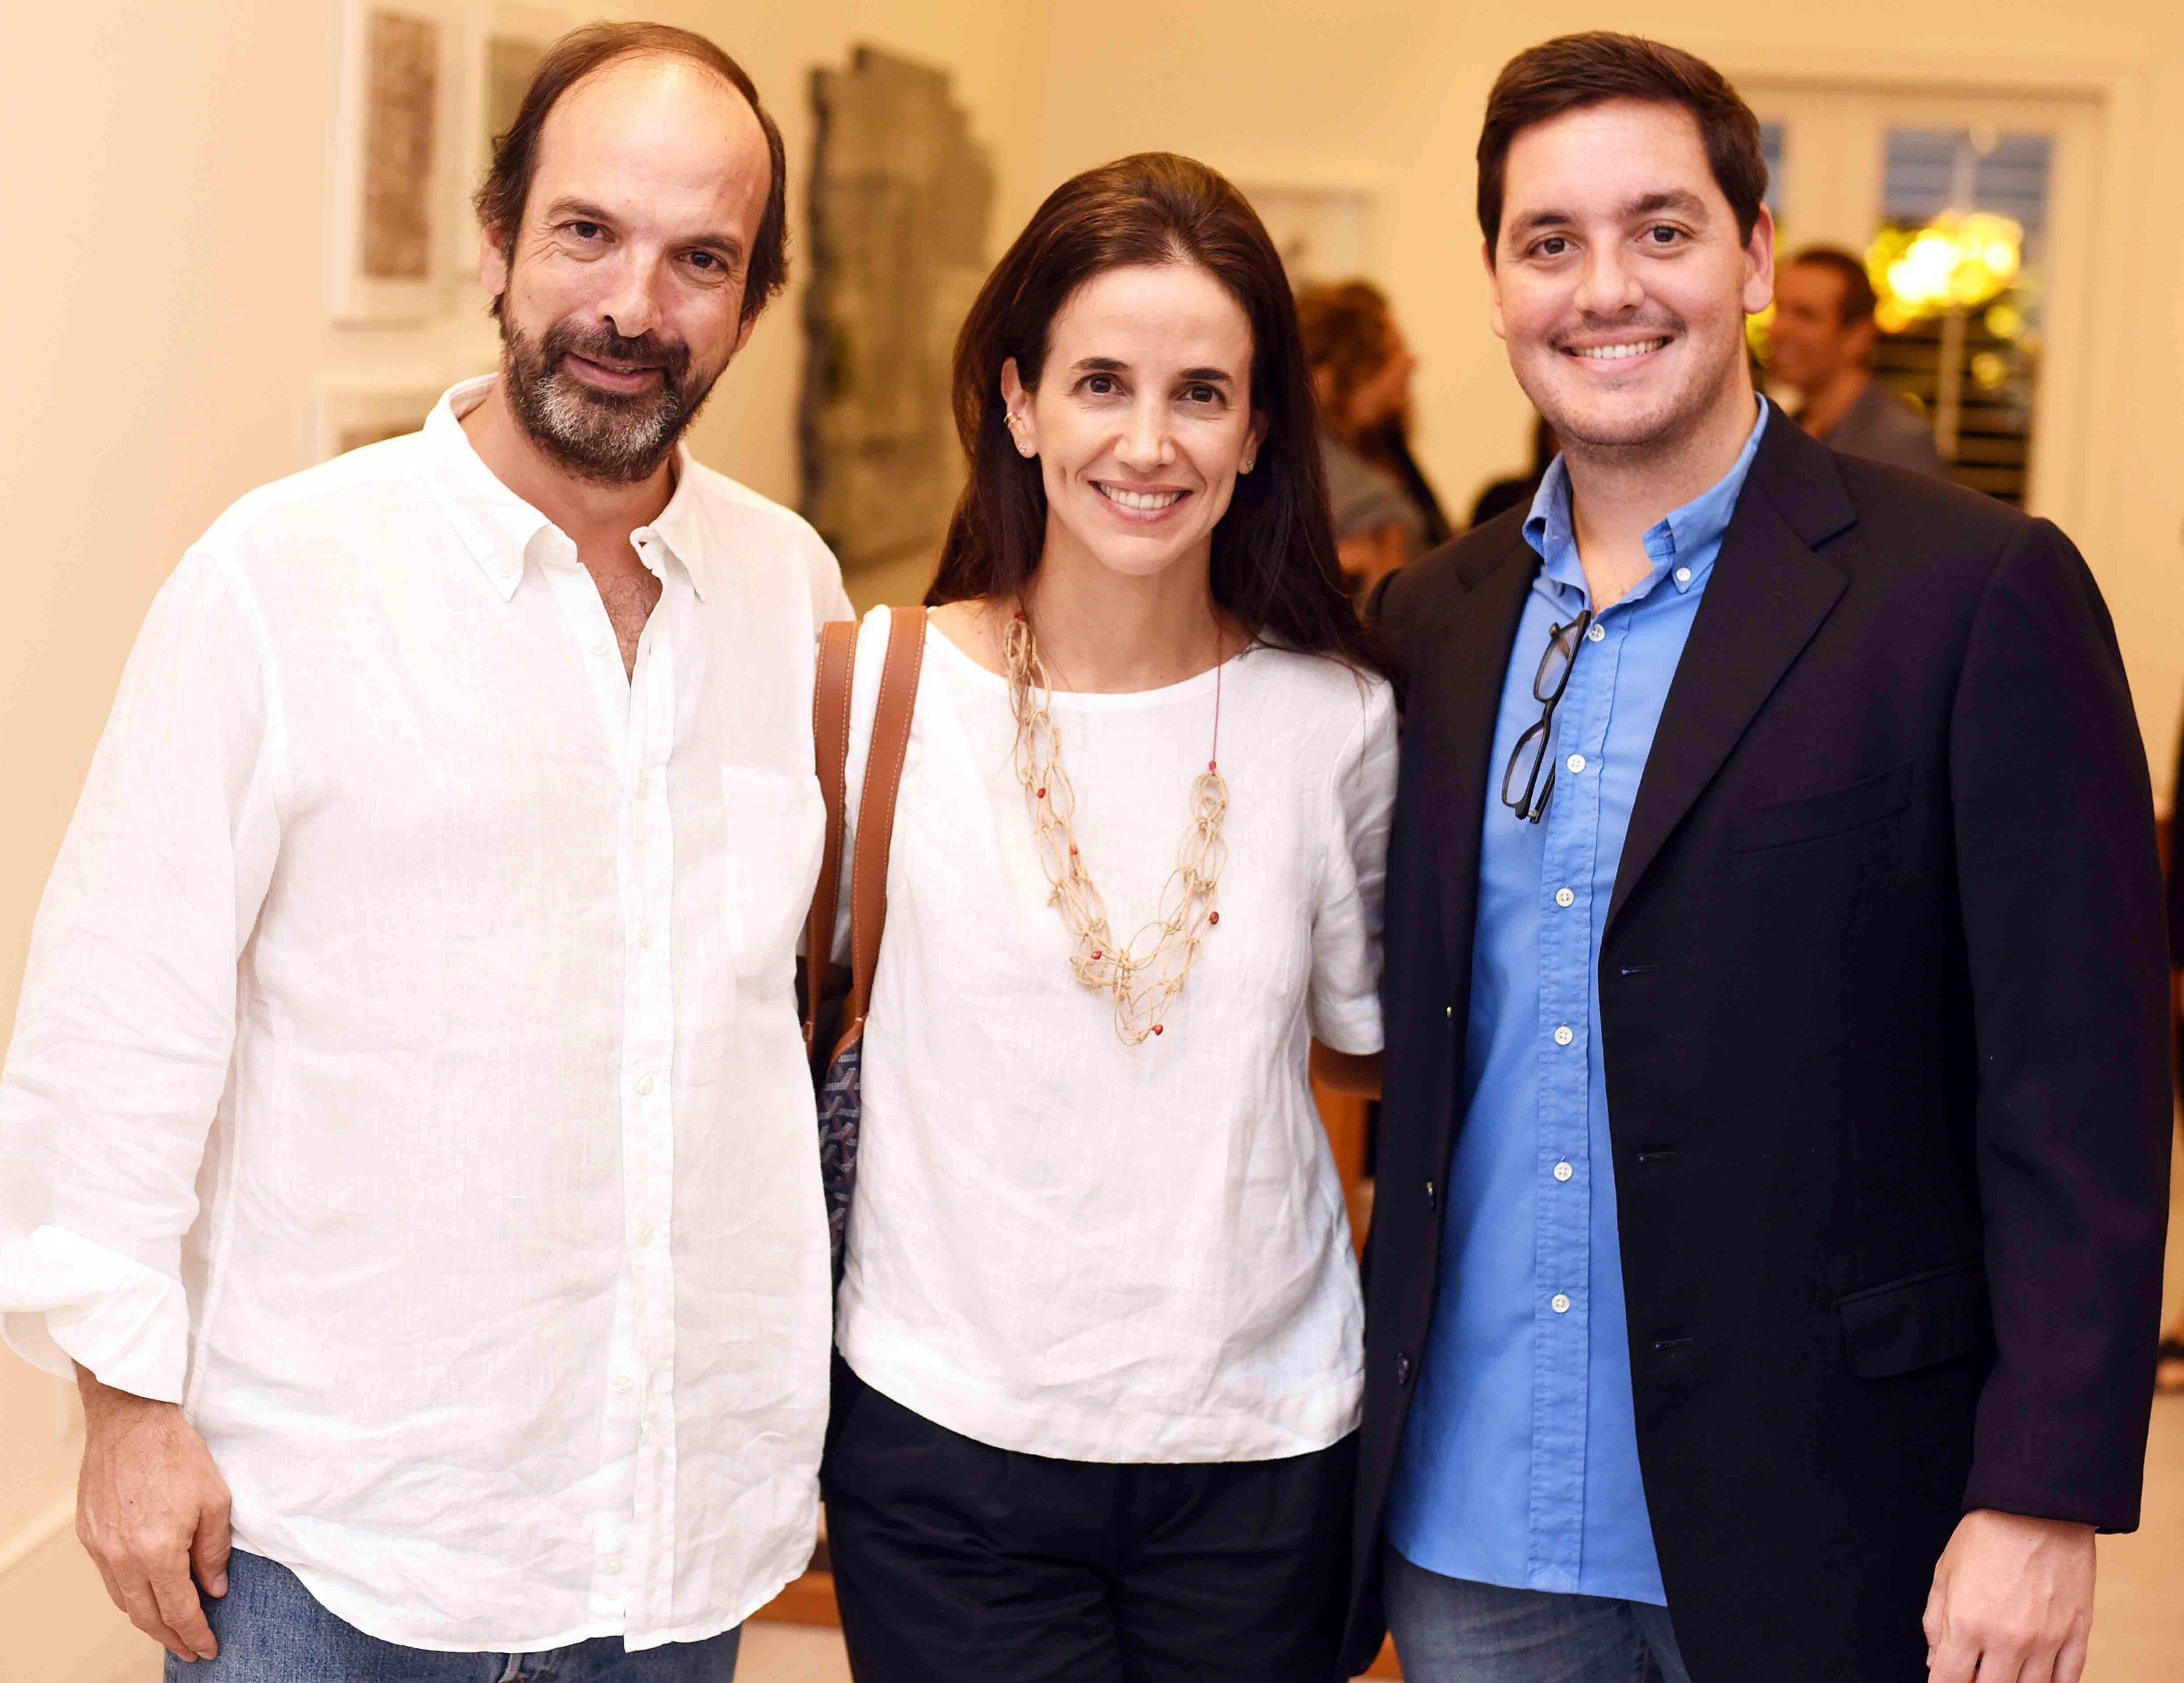 Gonçalo Cunha Ferreira, Camila Legey e Felipe Siqueira Cavalcanti/ Foto: Ari Kaye